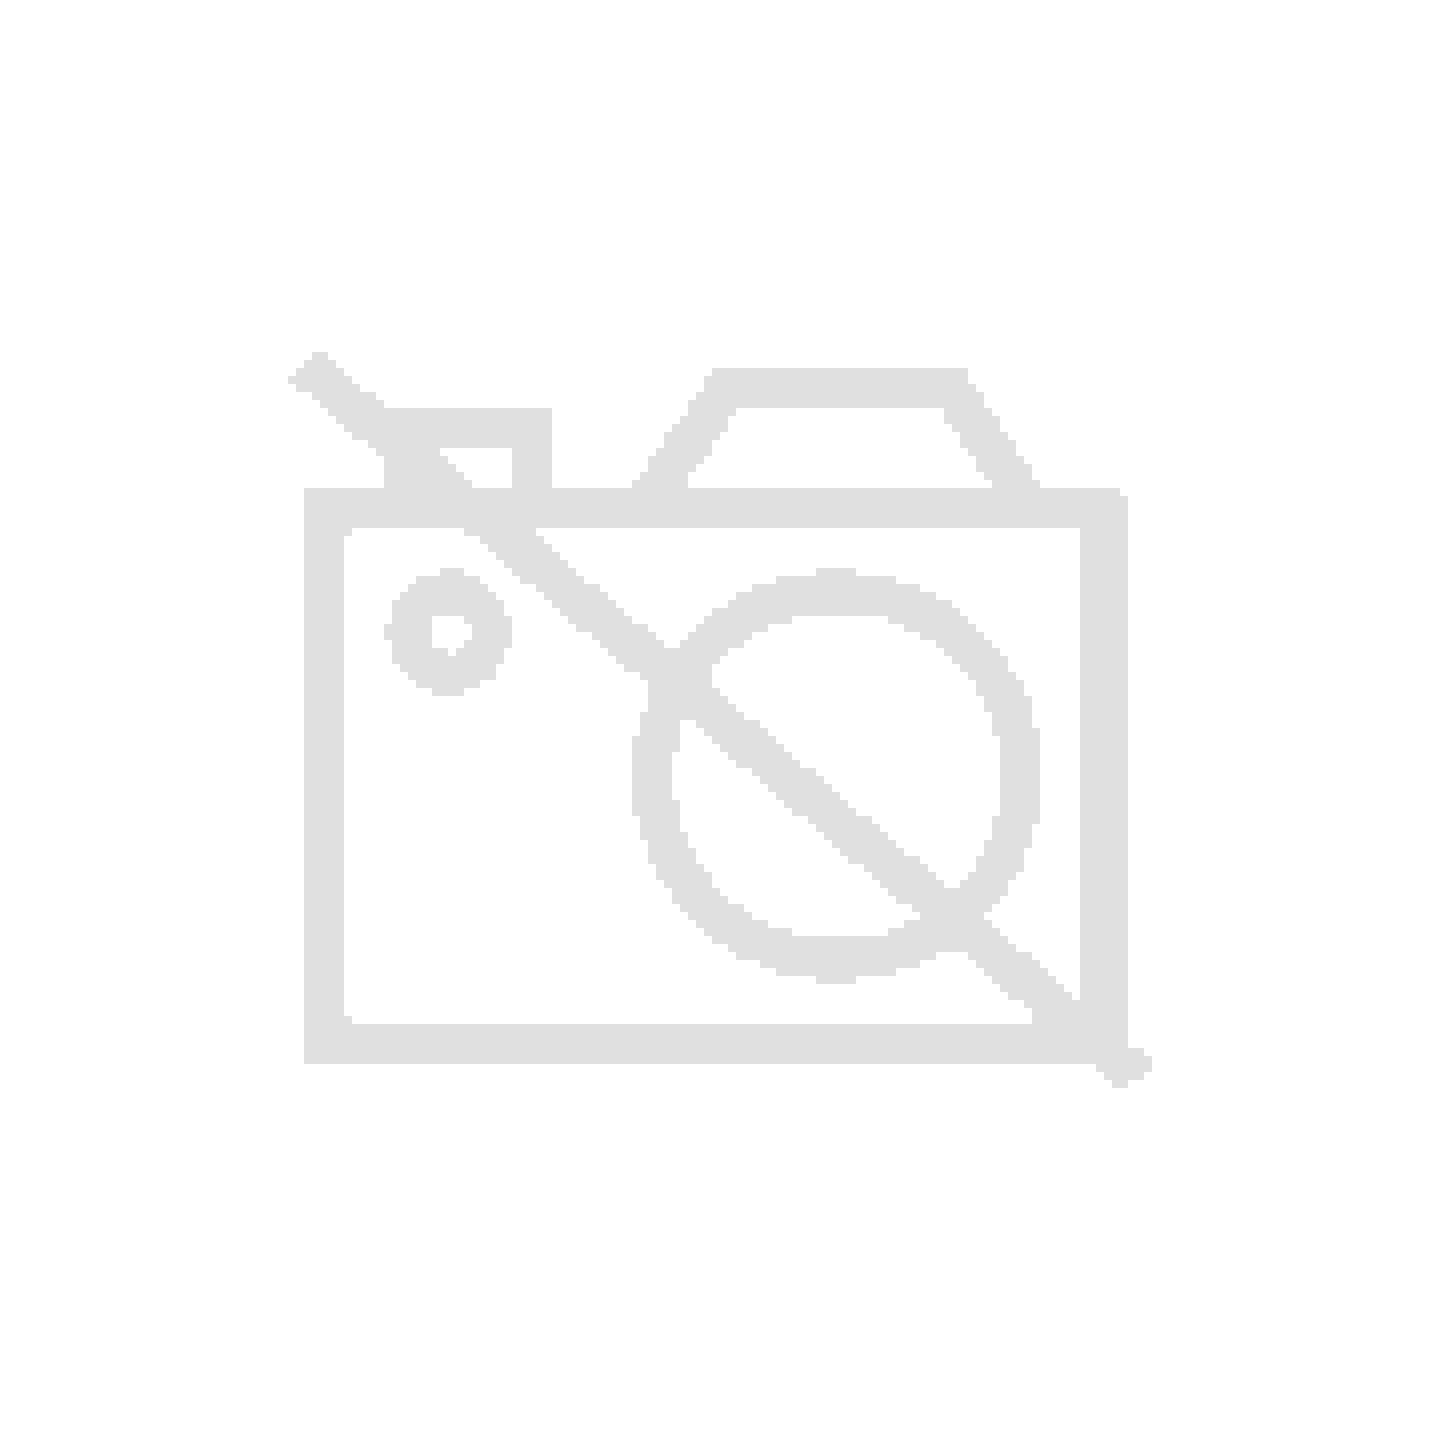 Epson EcoTank ET-2650 Tintenstrahl-Multifunktionsdrucker